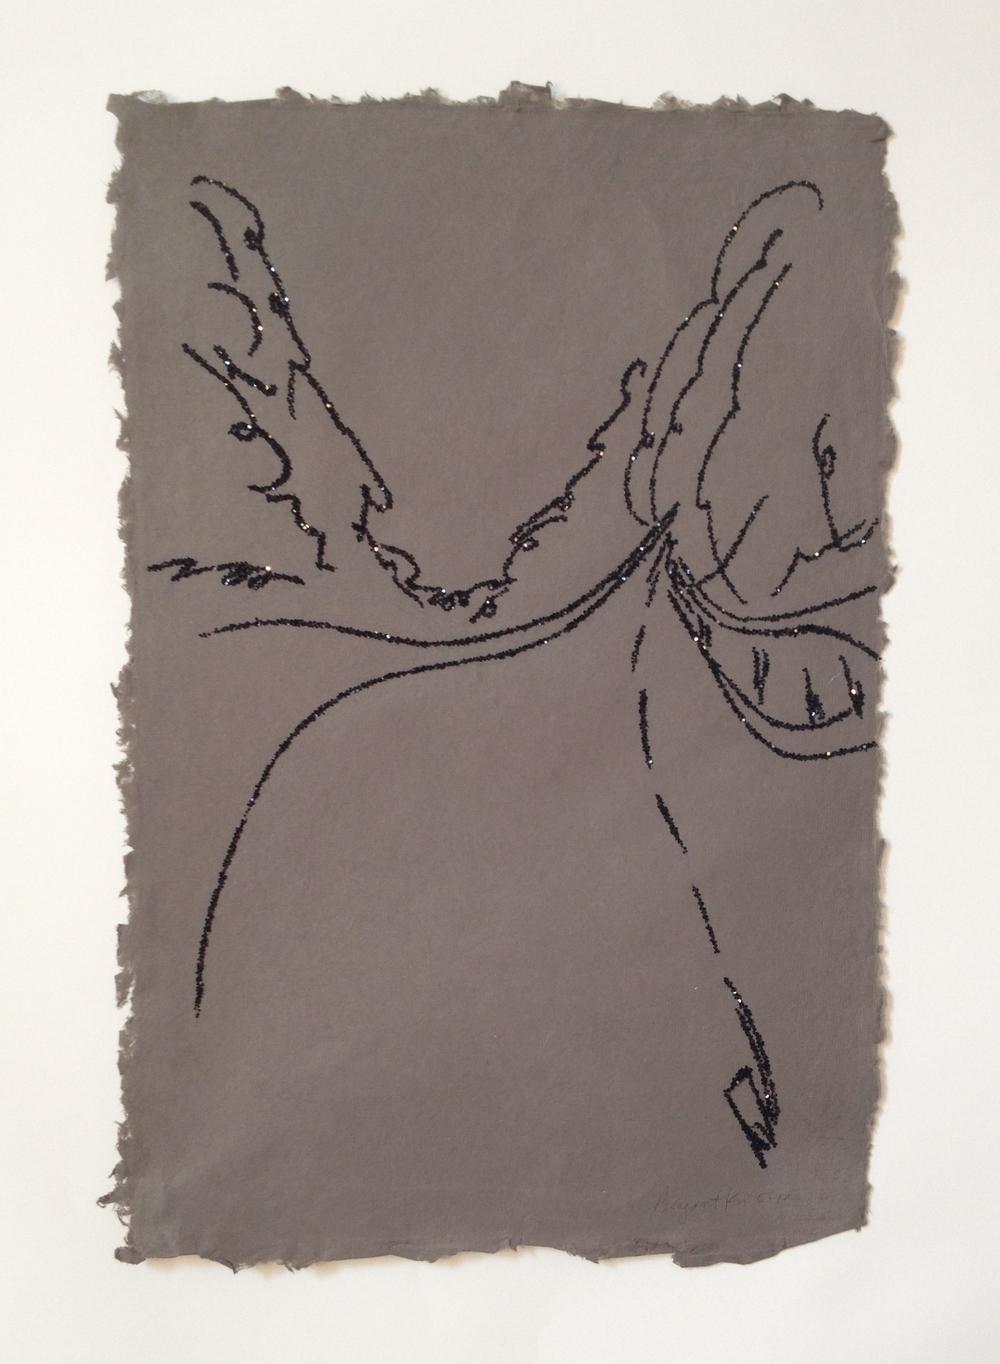 Glitter on paper, 2013  19 x 13 in.